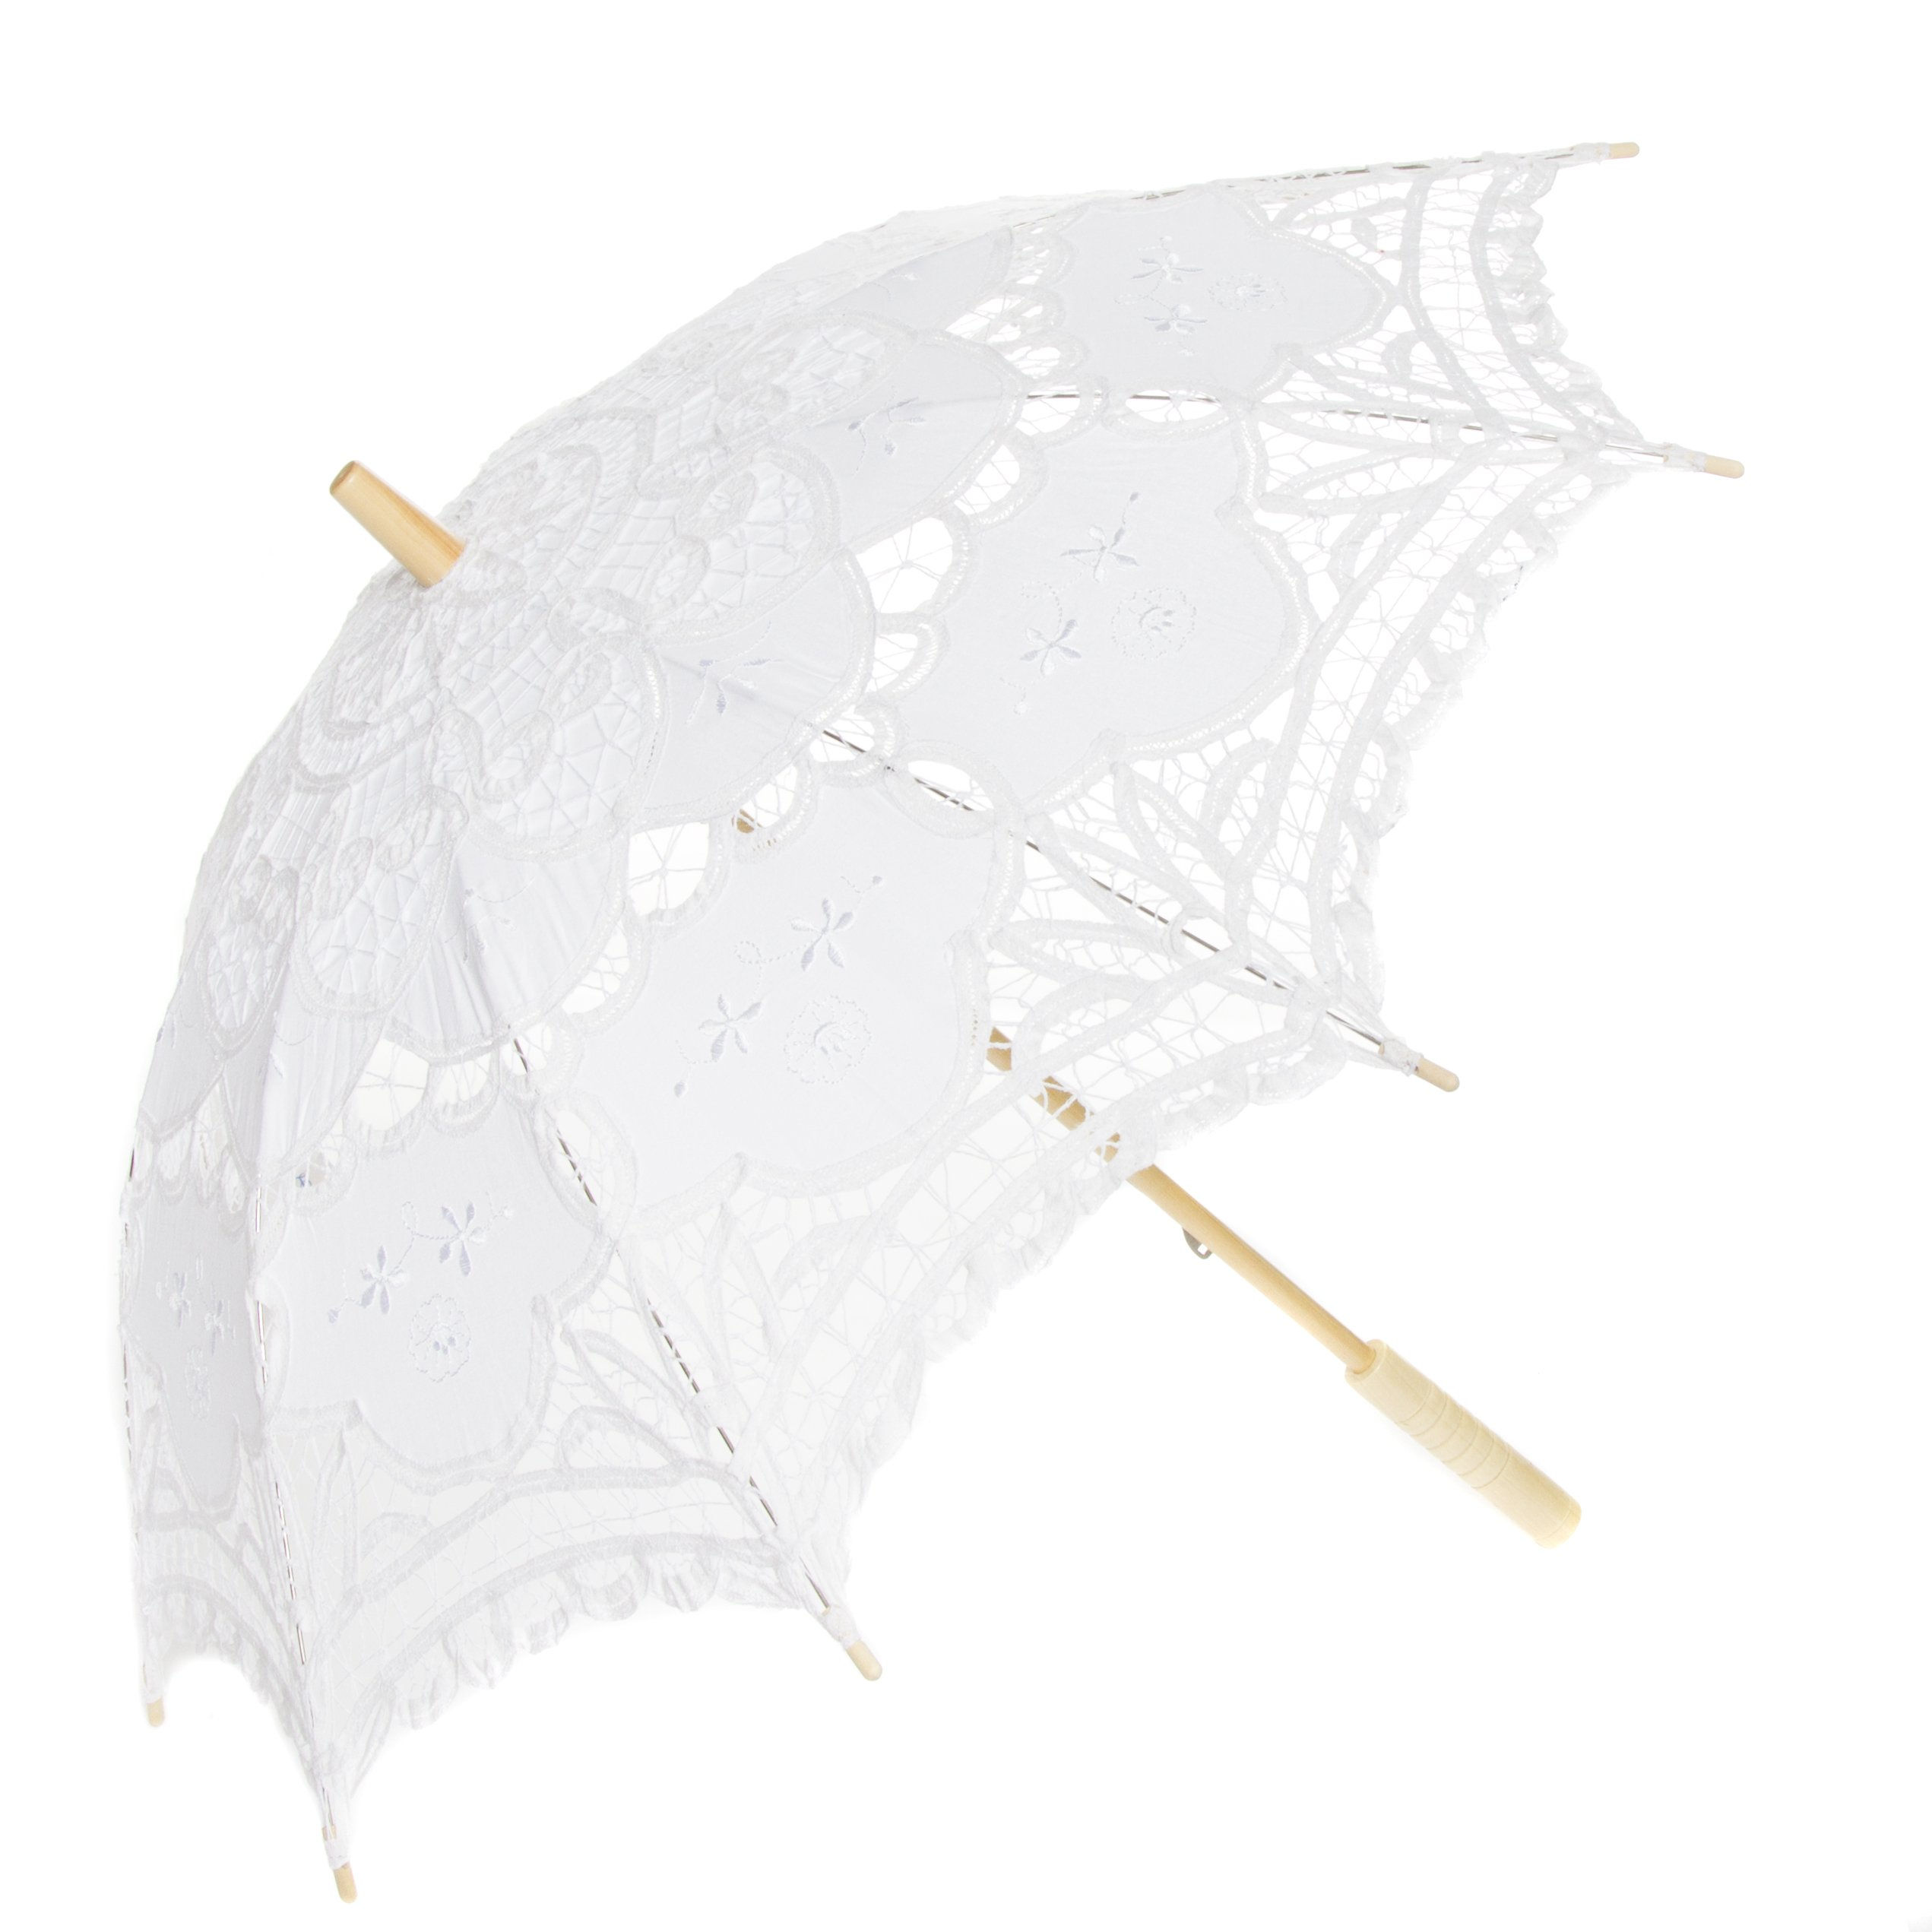 Leisureland Vintage Victorian Lace Parasol Umbrella White by Leisureland (Image #1)